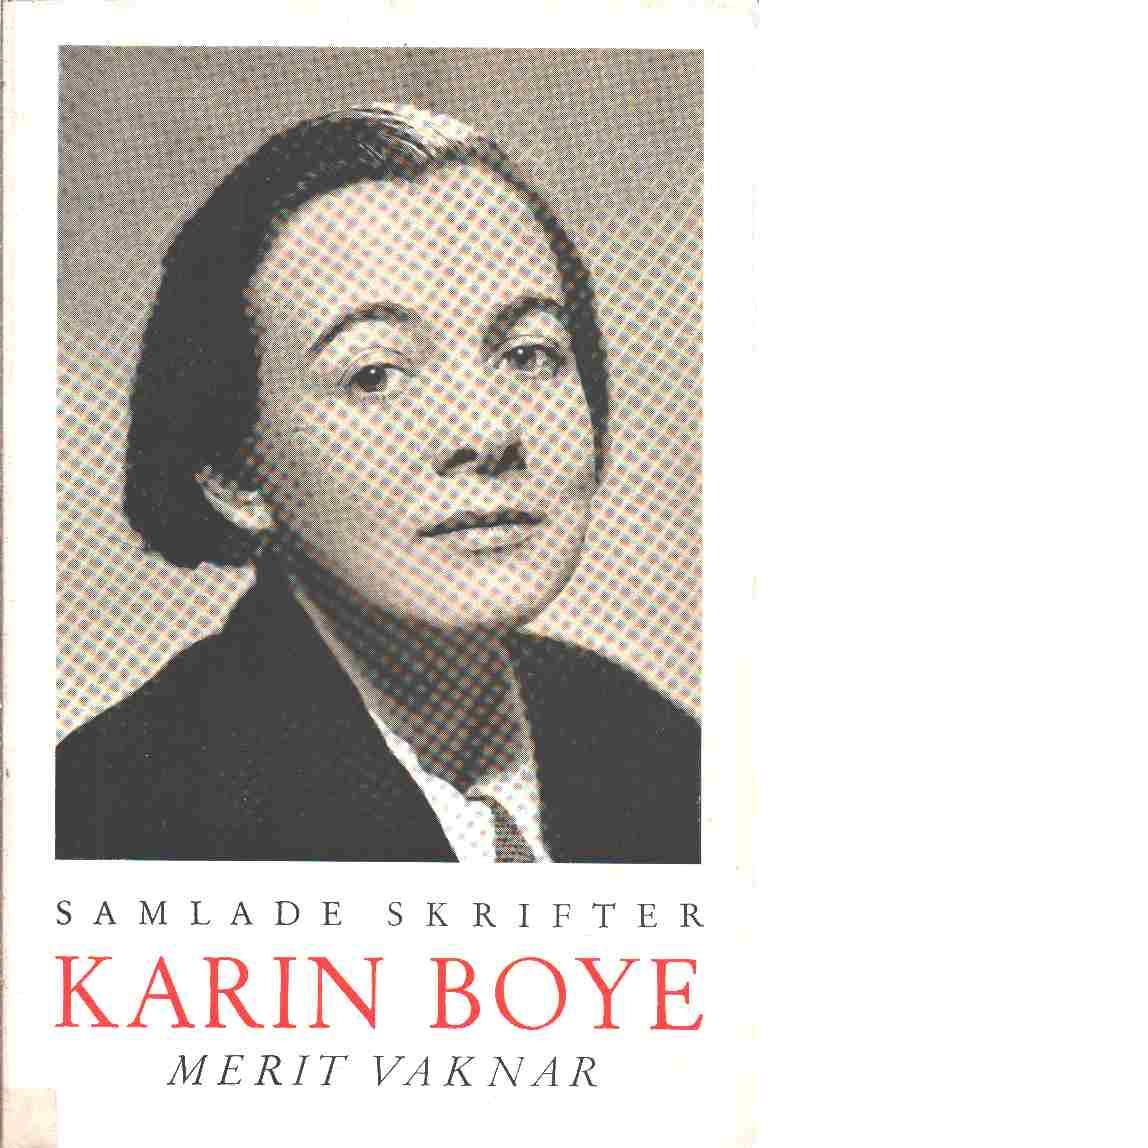 Samlade skrifter. [2], Merit vaknar - Boye, Karin